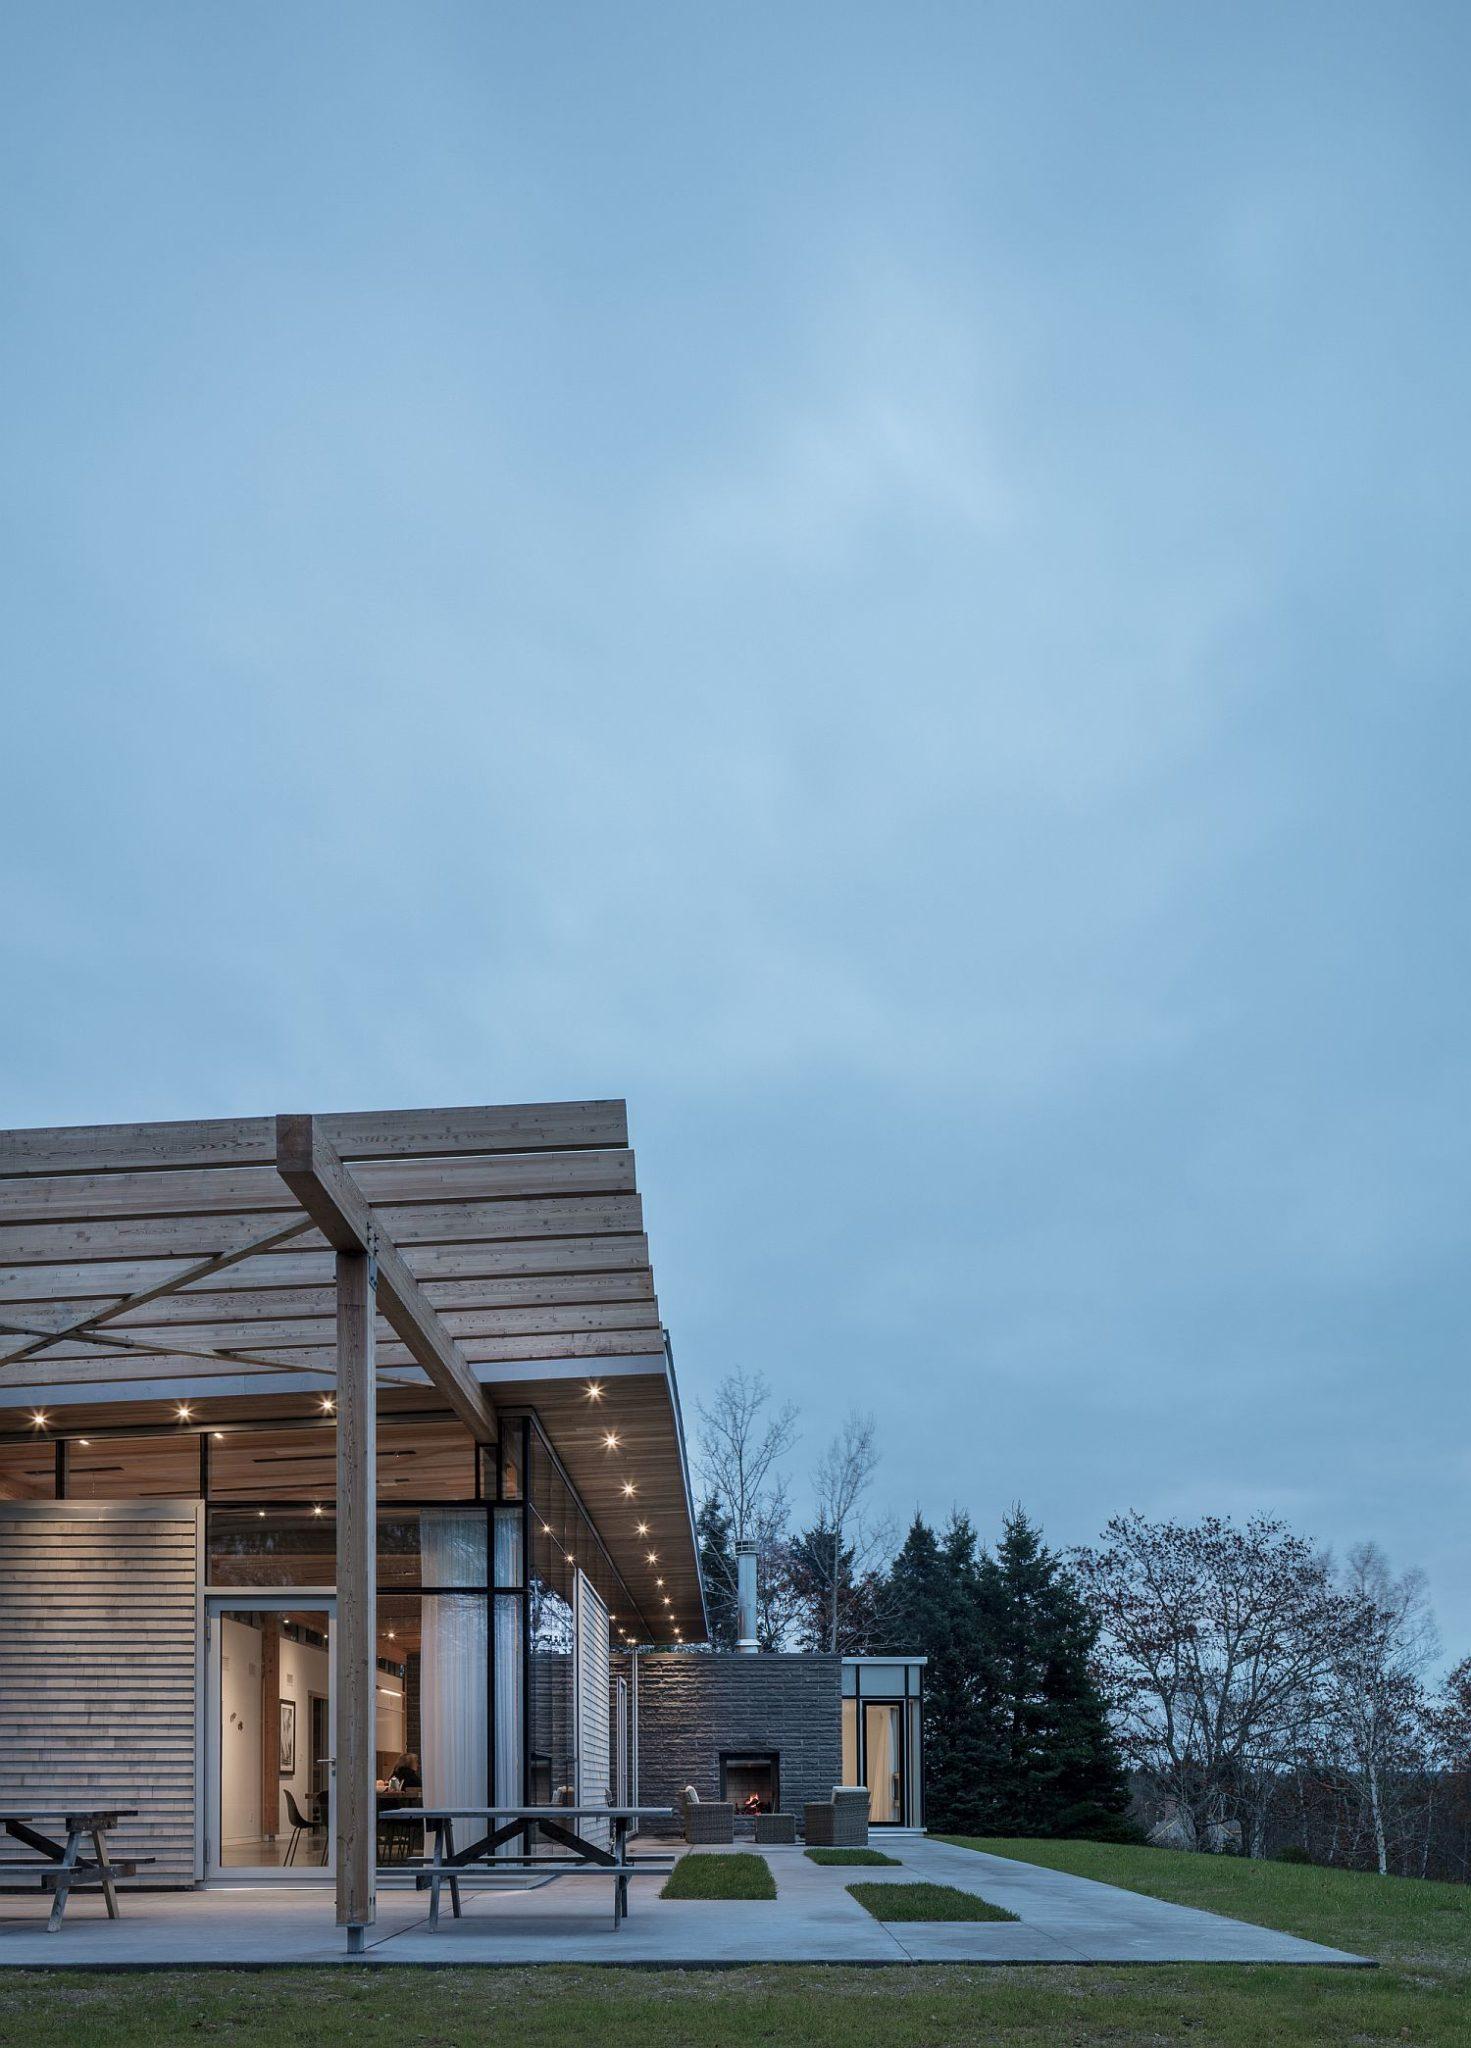 Beautiful recessed lights provide illumination around the house